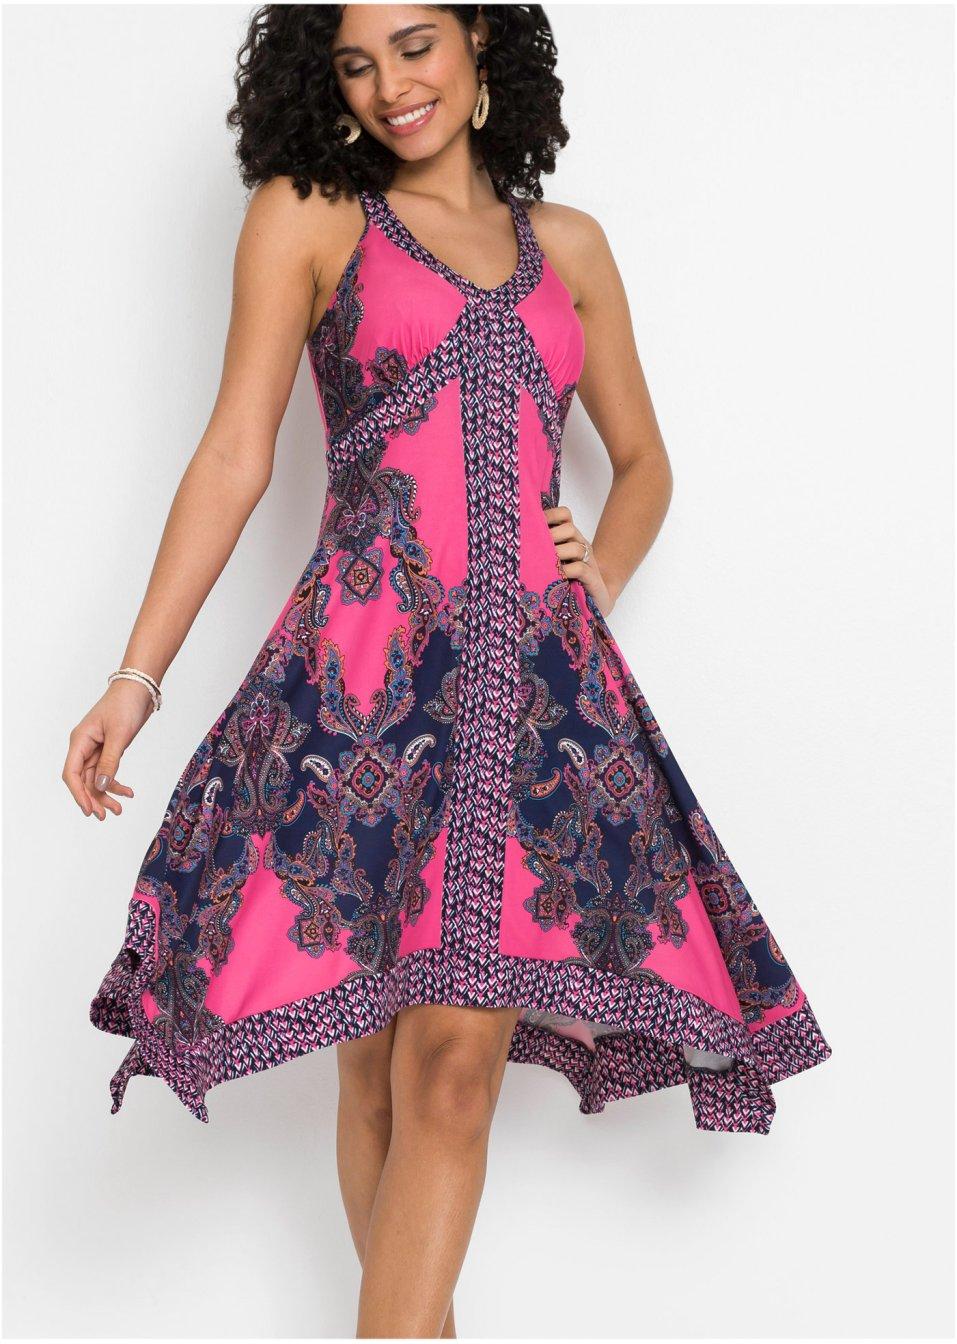 Mode Femme Vêtements DJLfdOFlkj Robe en jersey imprimée avec base asymétrique rose motif cachemire Femme BODYFLIRT .fr